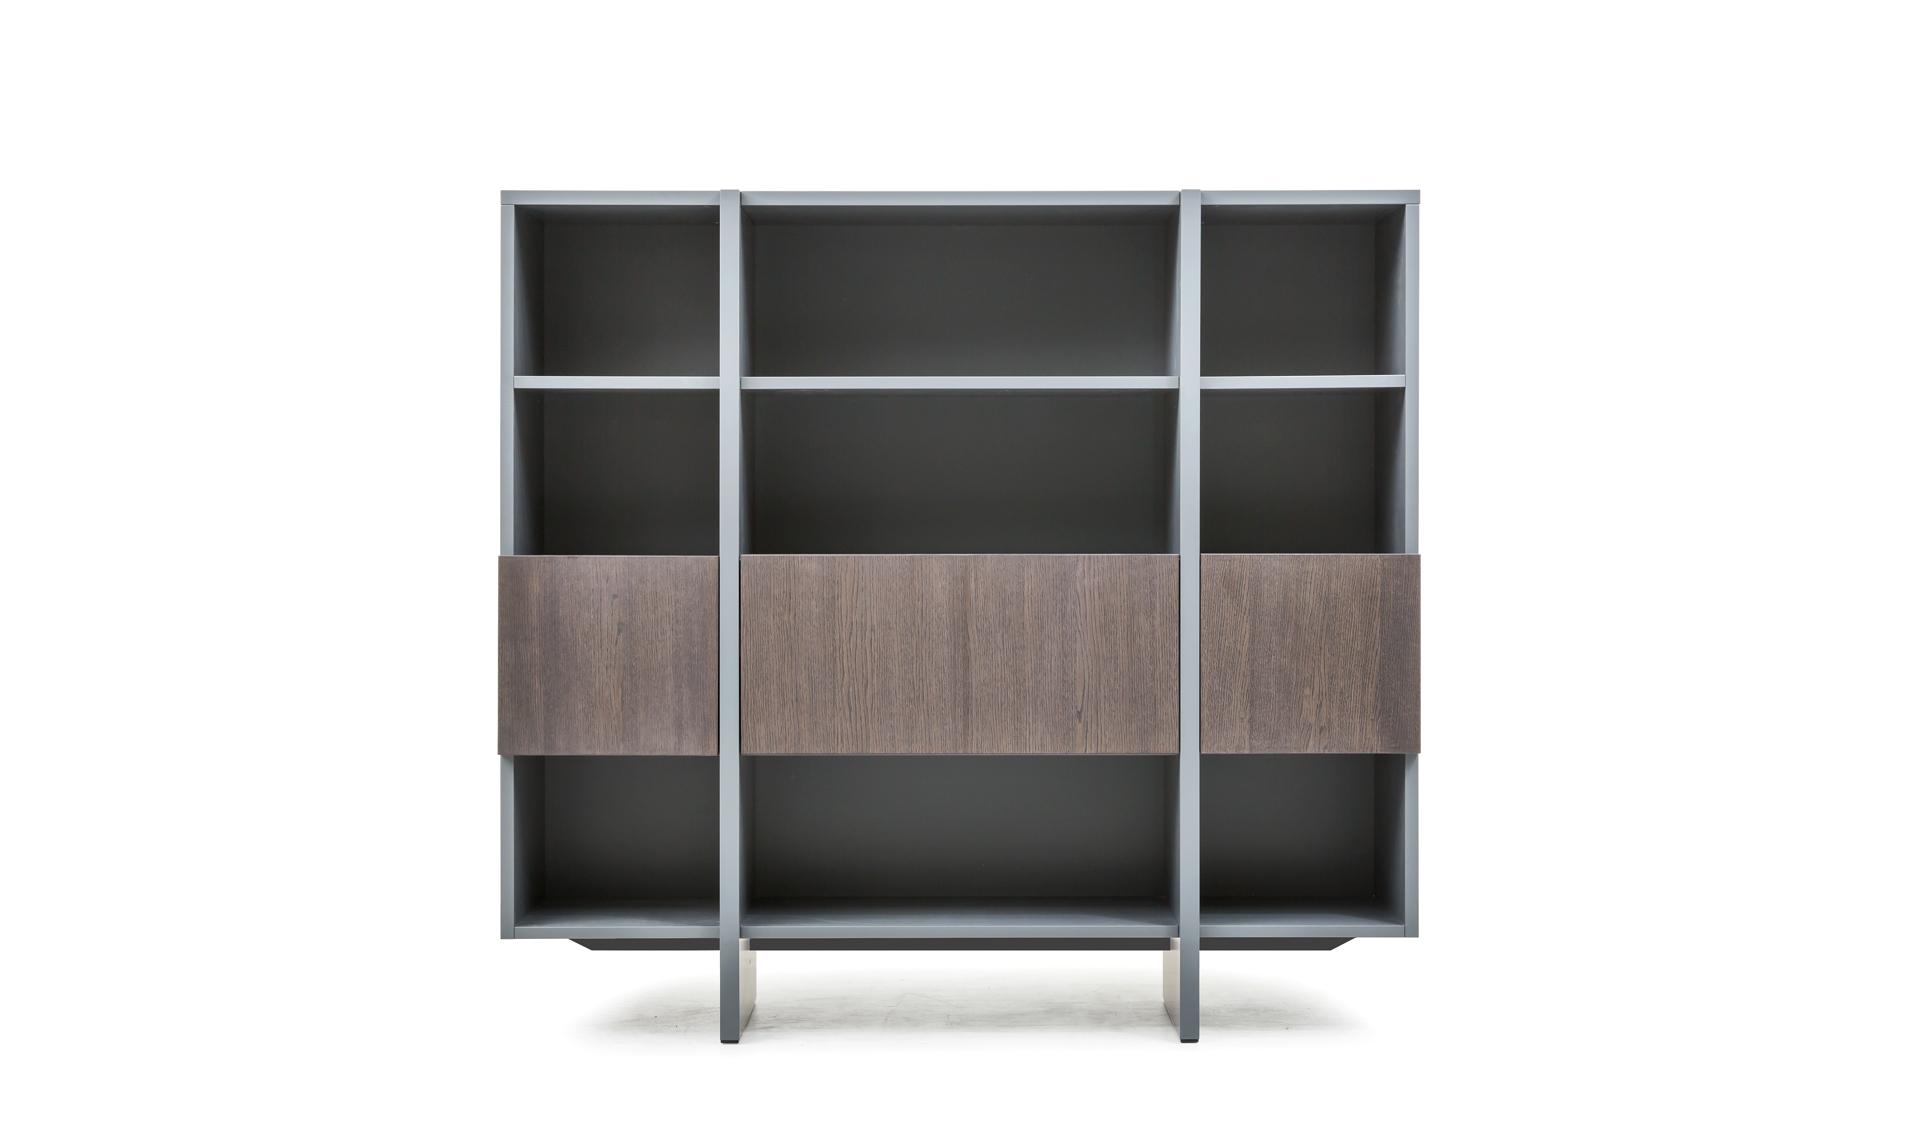 Credenza Con Libreria : Libreria recta con ante interior s project